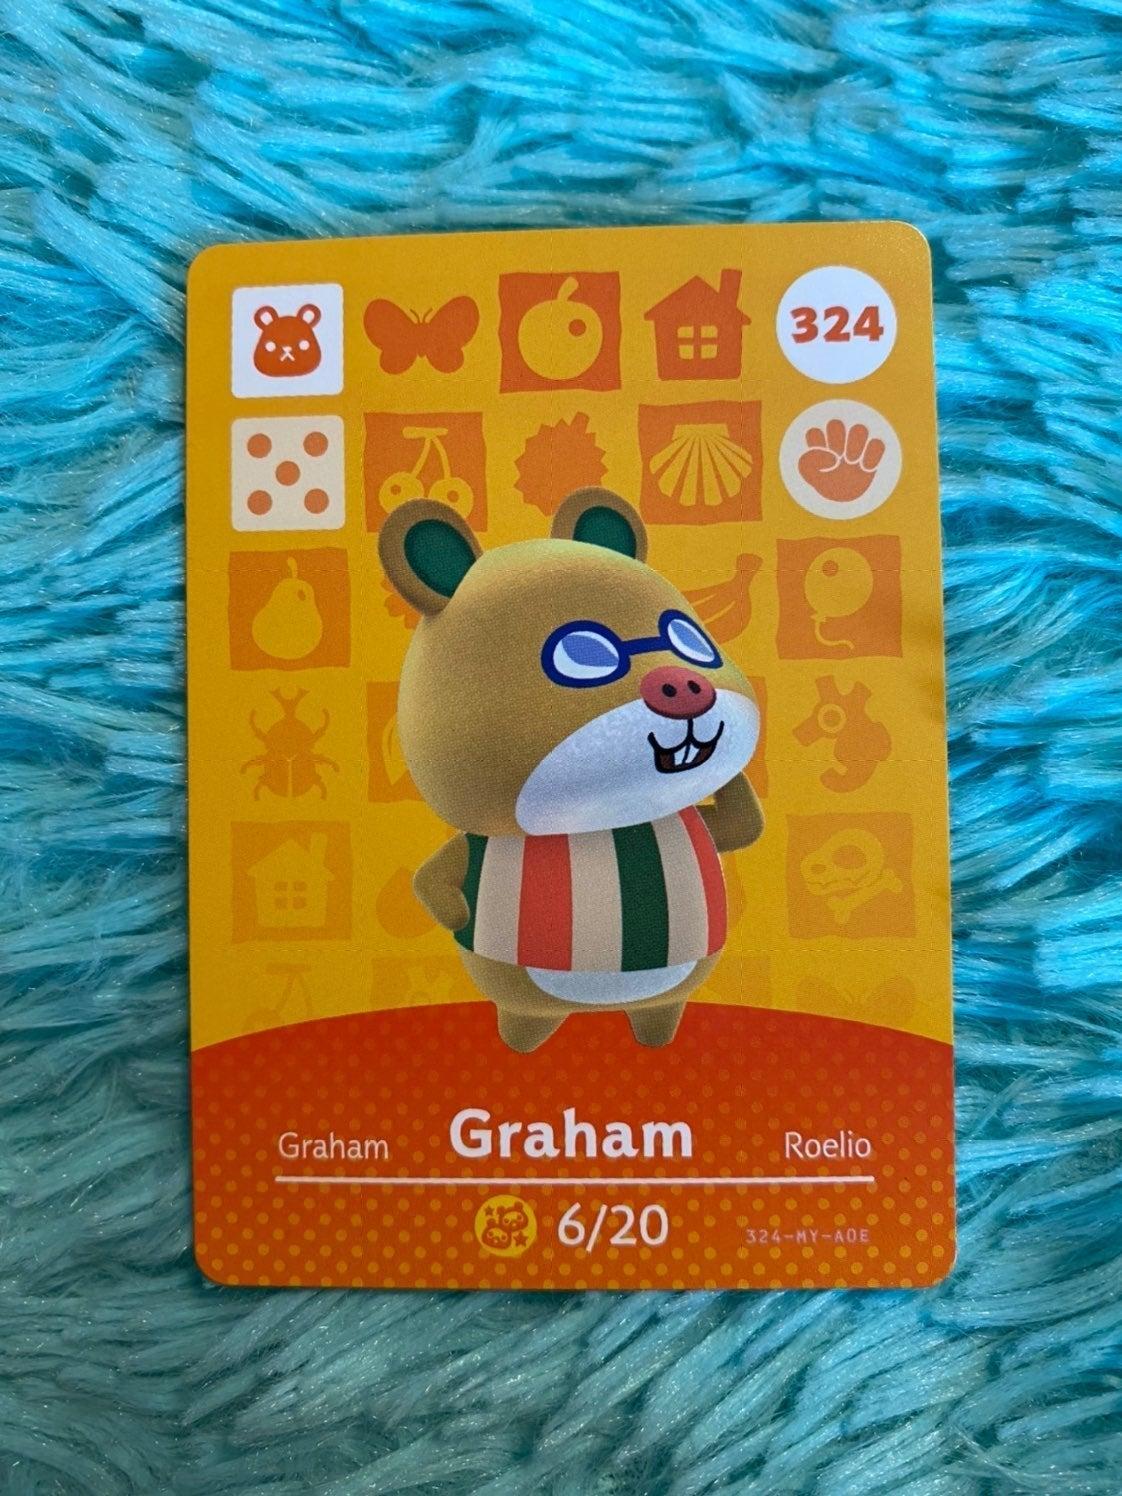 Graham - Animal Crossing Amiibo Card